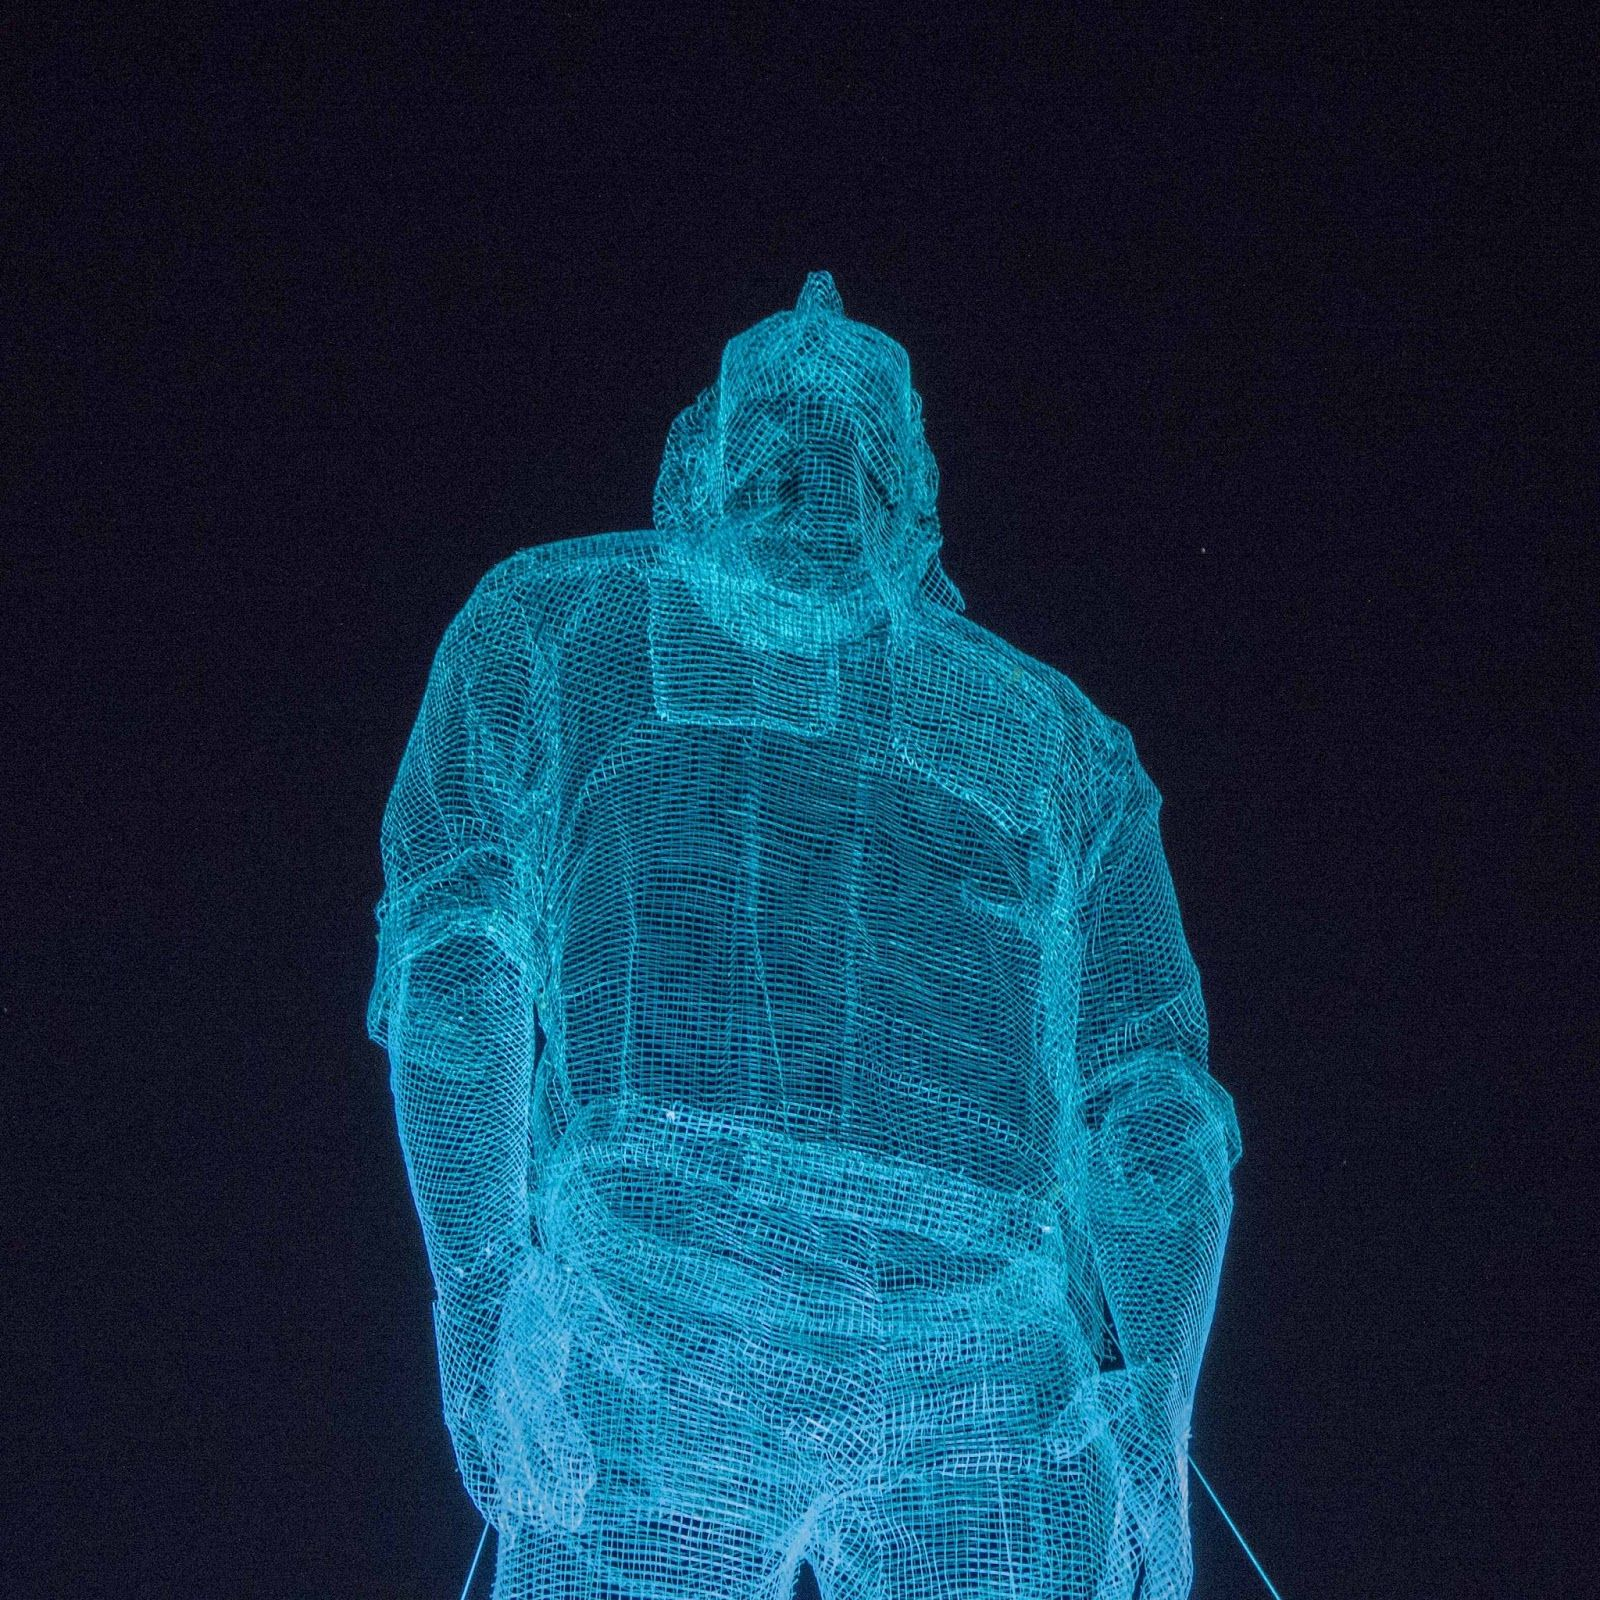 Edoardo Tresoldi brings his giant sculptures to Roskilde Festival ...